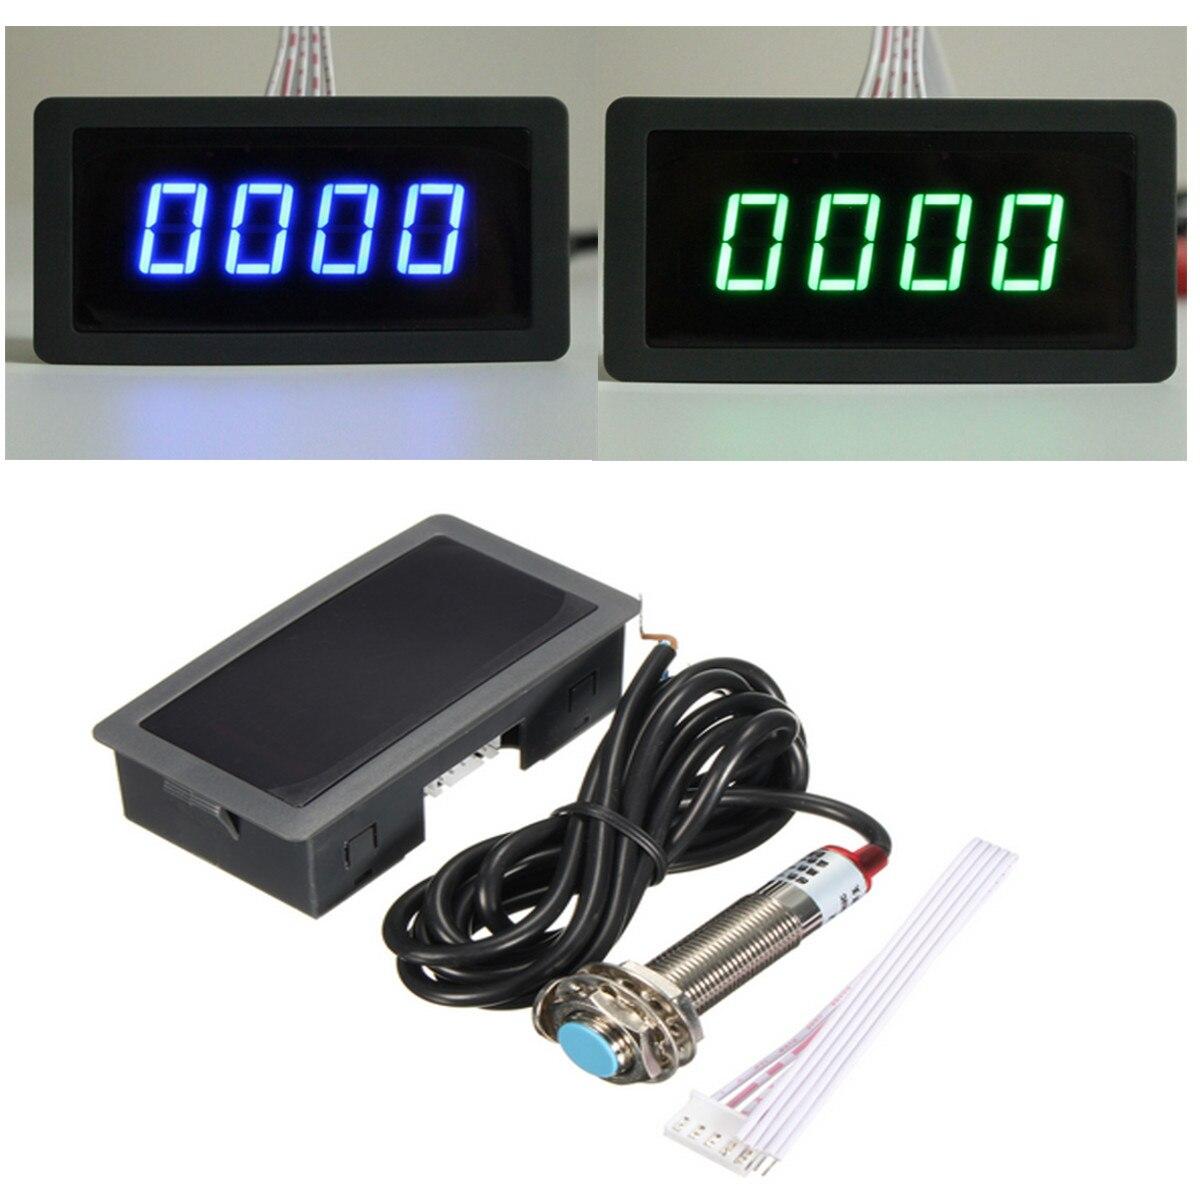 4 Digital Green LED Tachometer RPM Speed Meter+Proximity Switch Sensor 12V Measure range 5-9999RPM4 Digital Green LED Tachometer RPM Speed Meter+Proximity Switch Sensor 12V Measure range 5-9999RPM